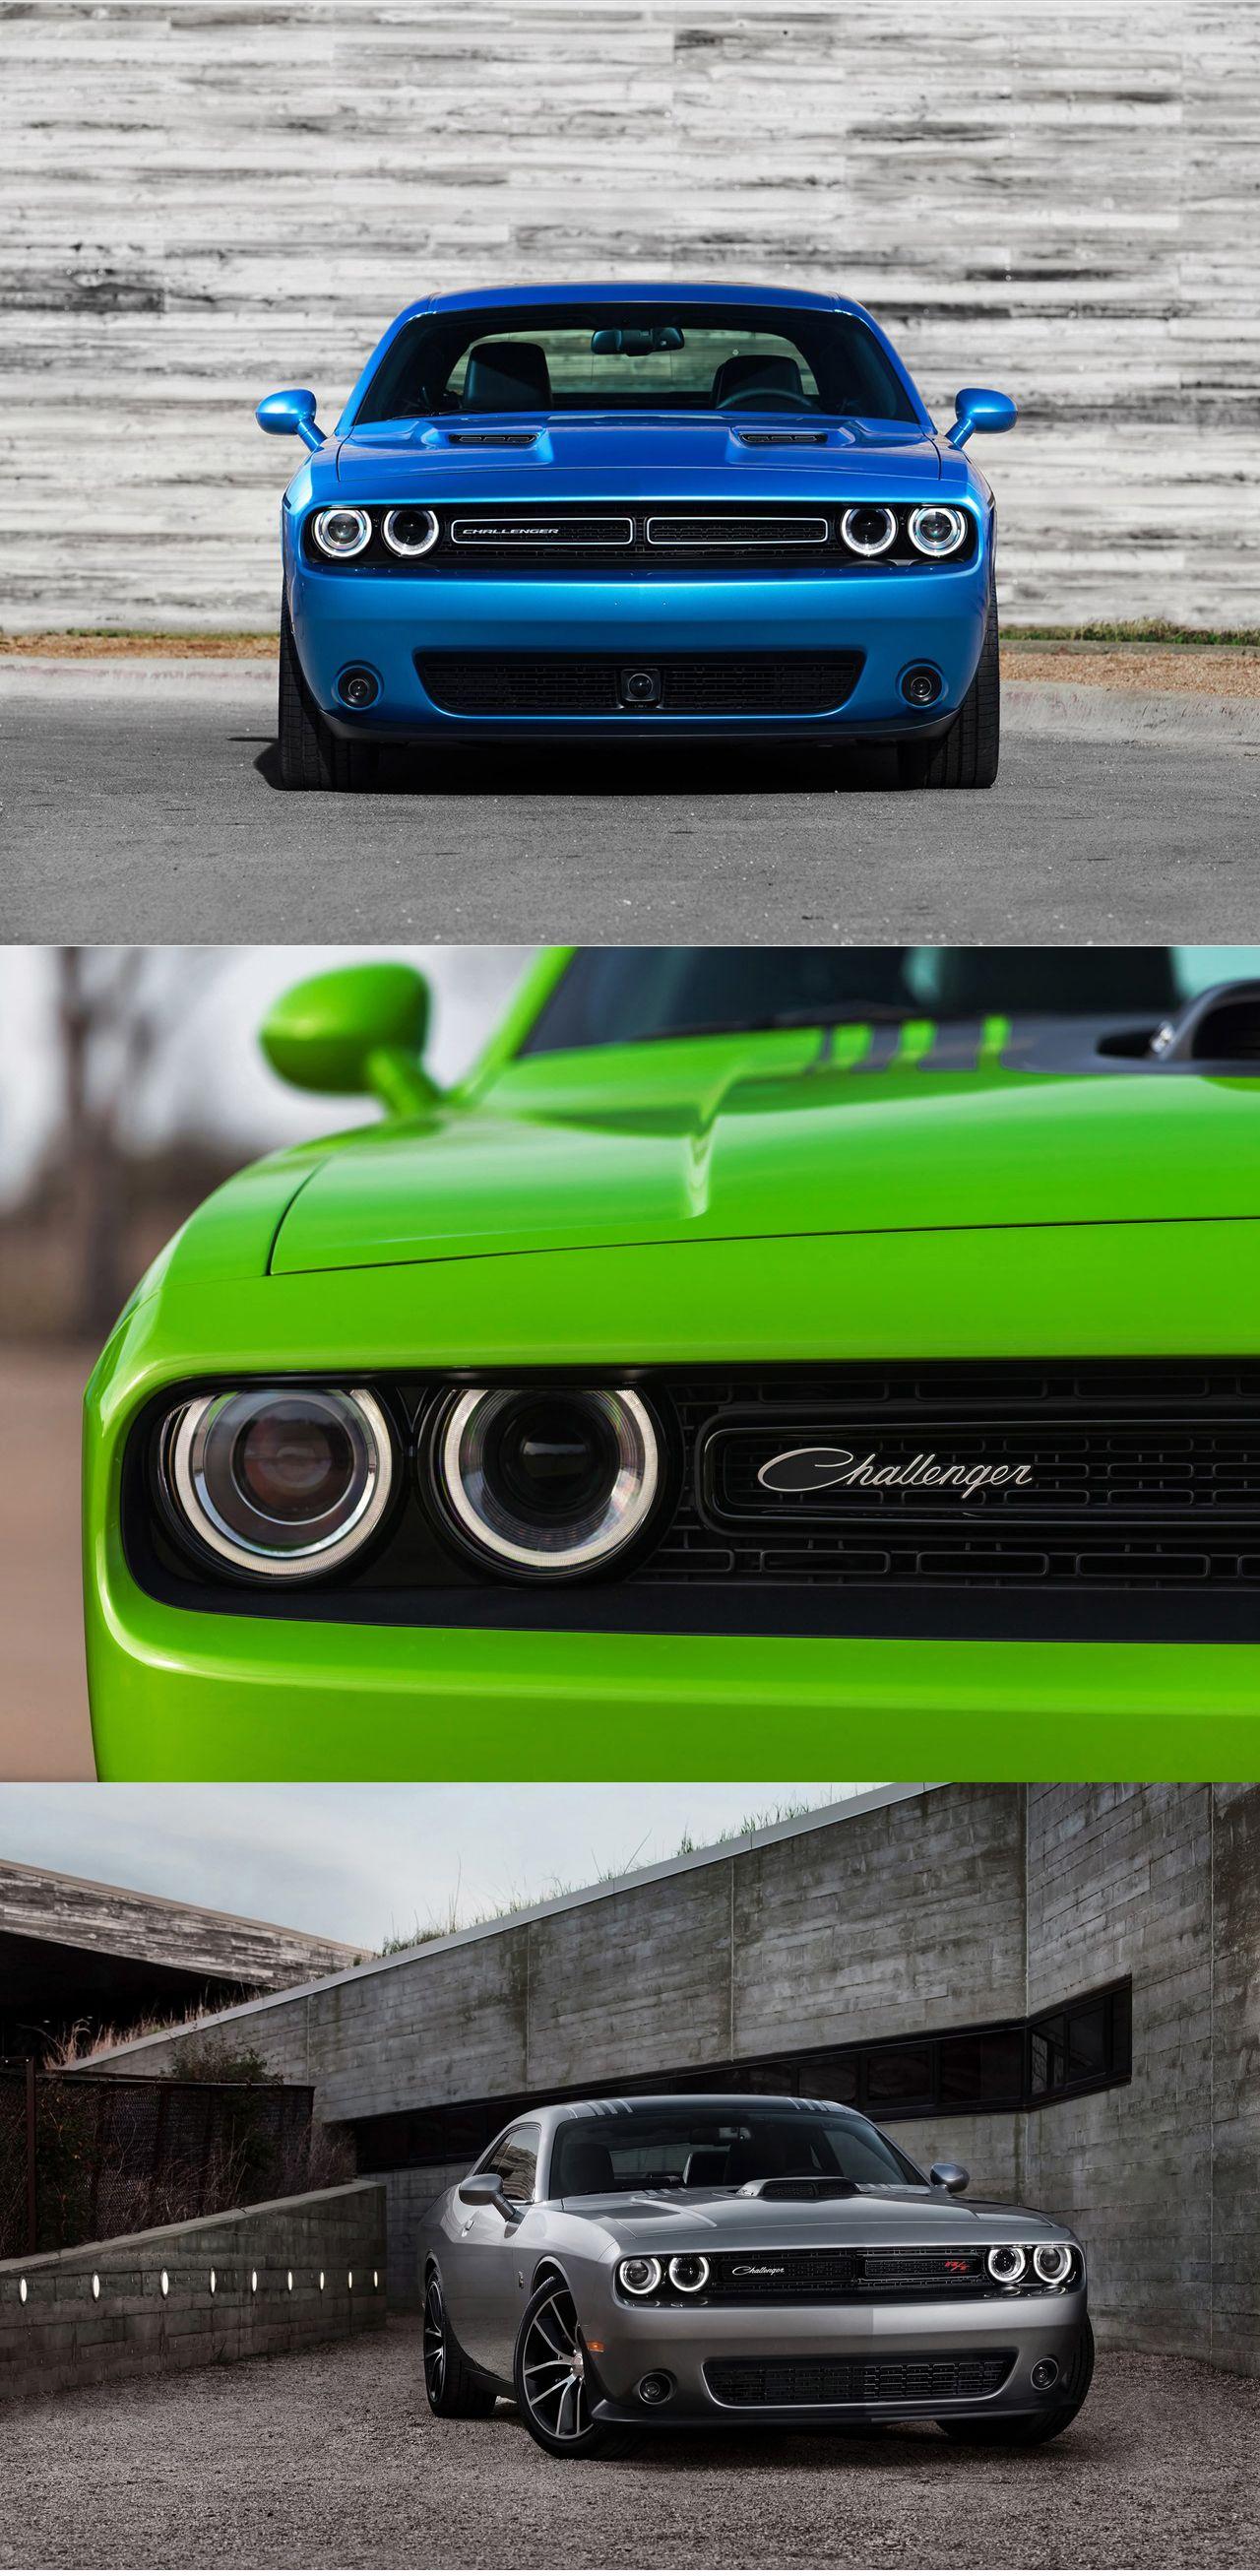 Dodge Has Revamped Their 2 Door Muscle Car 2015 Dodge Challenger For